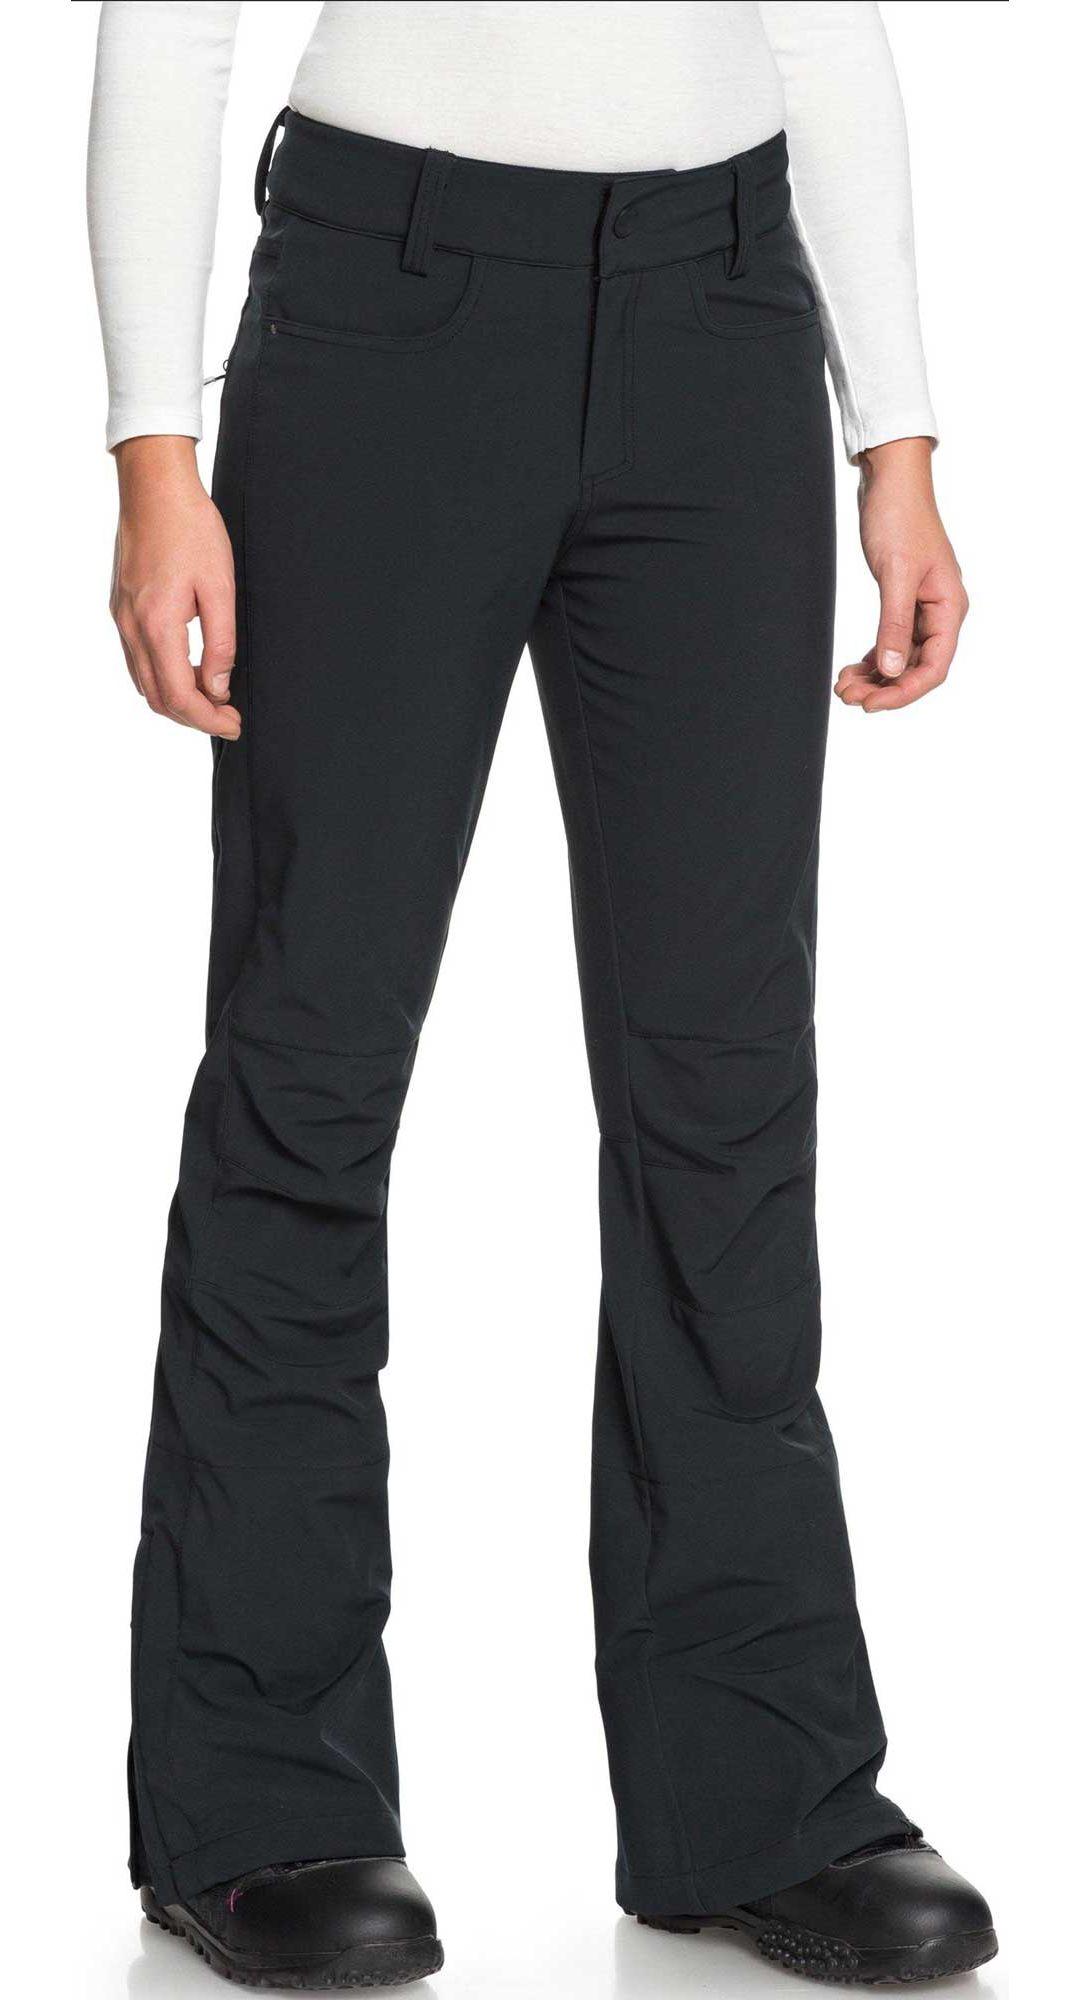 9b99a998e0cfa Roxy Women's Creek Snow Pants   DICK'S Sporting Goods